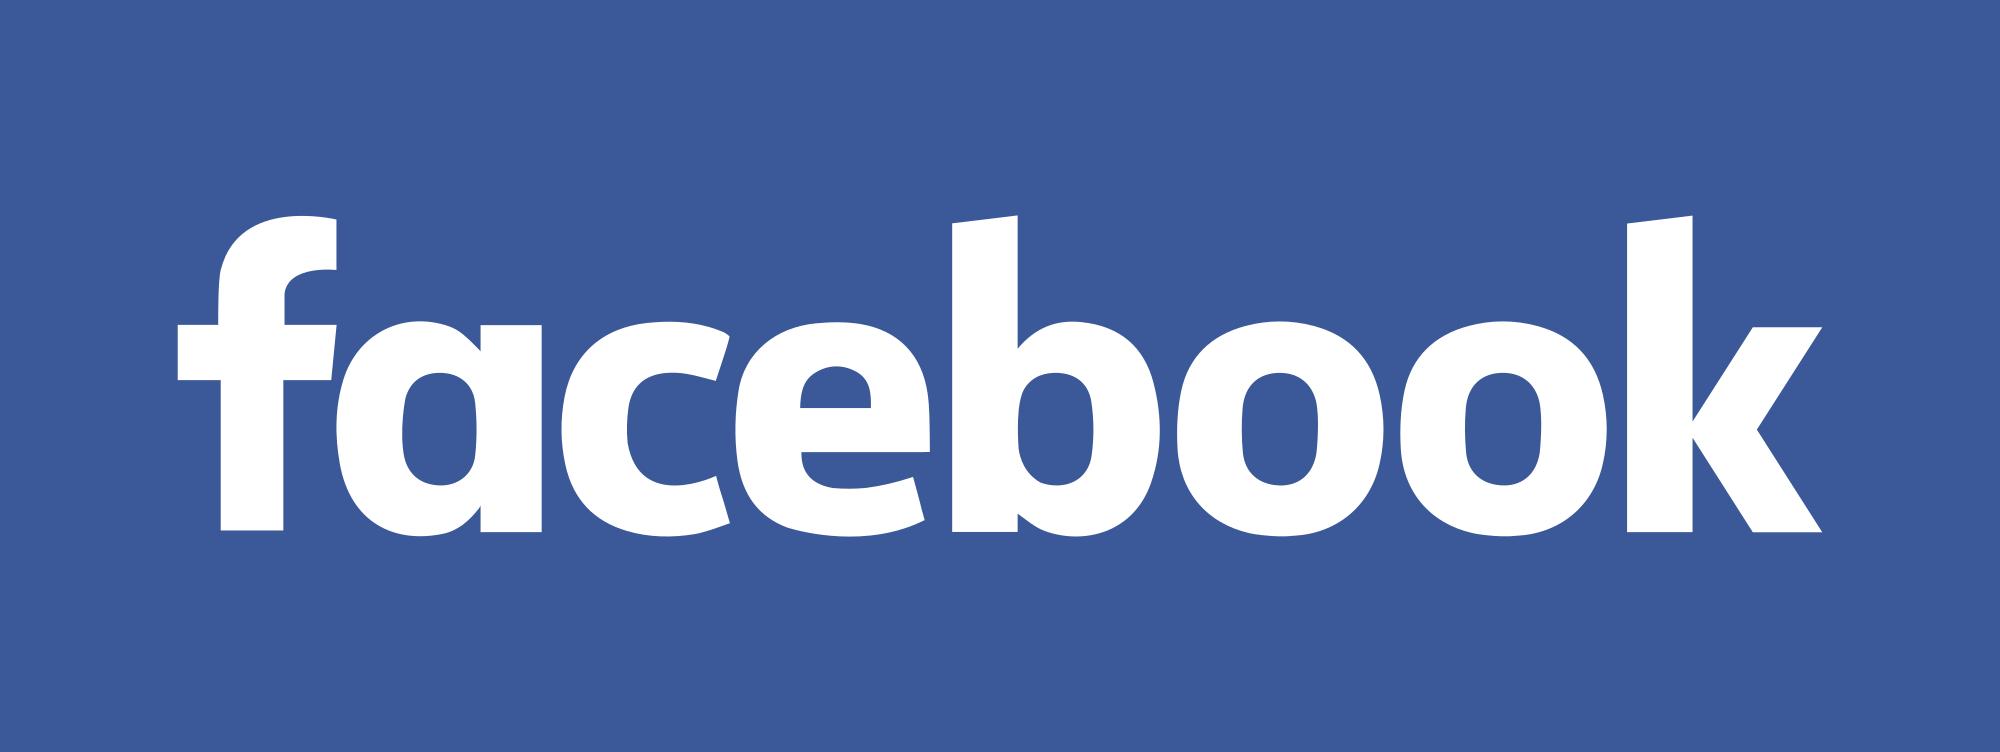 Chiudi Facebook di una persona deceduta 1